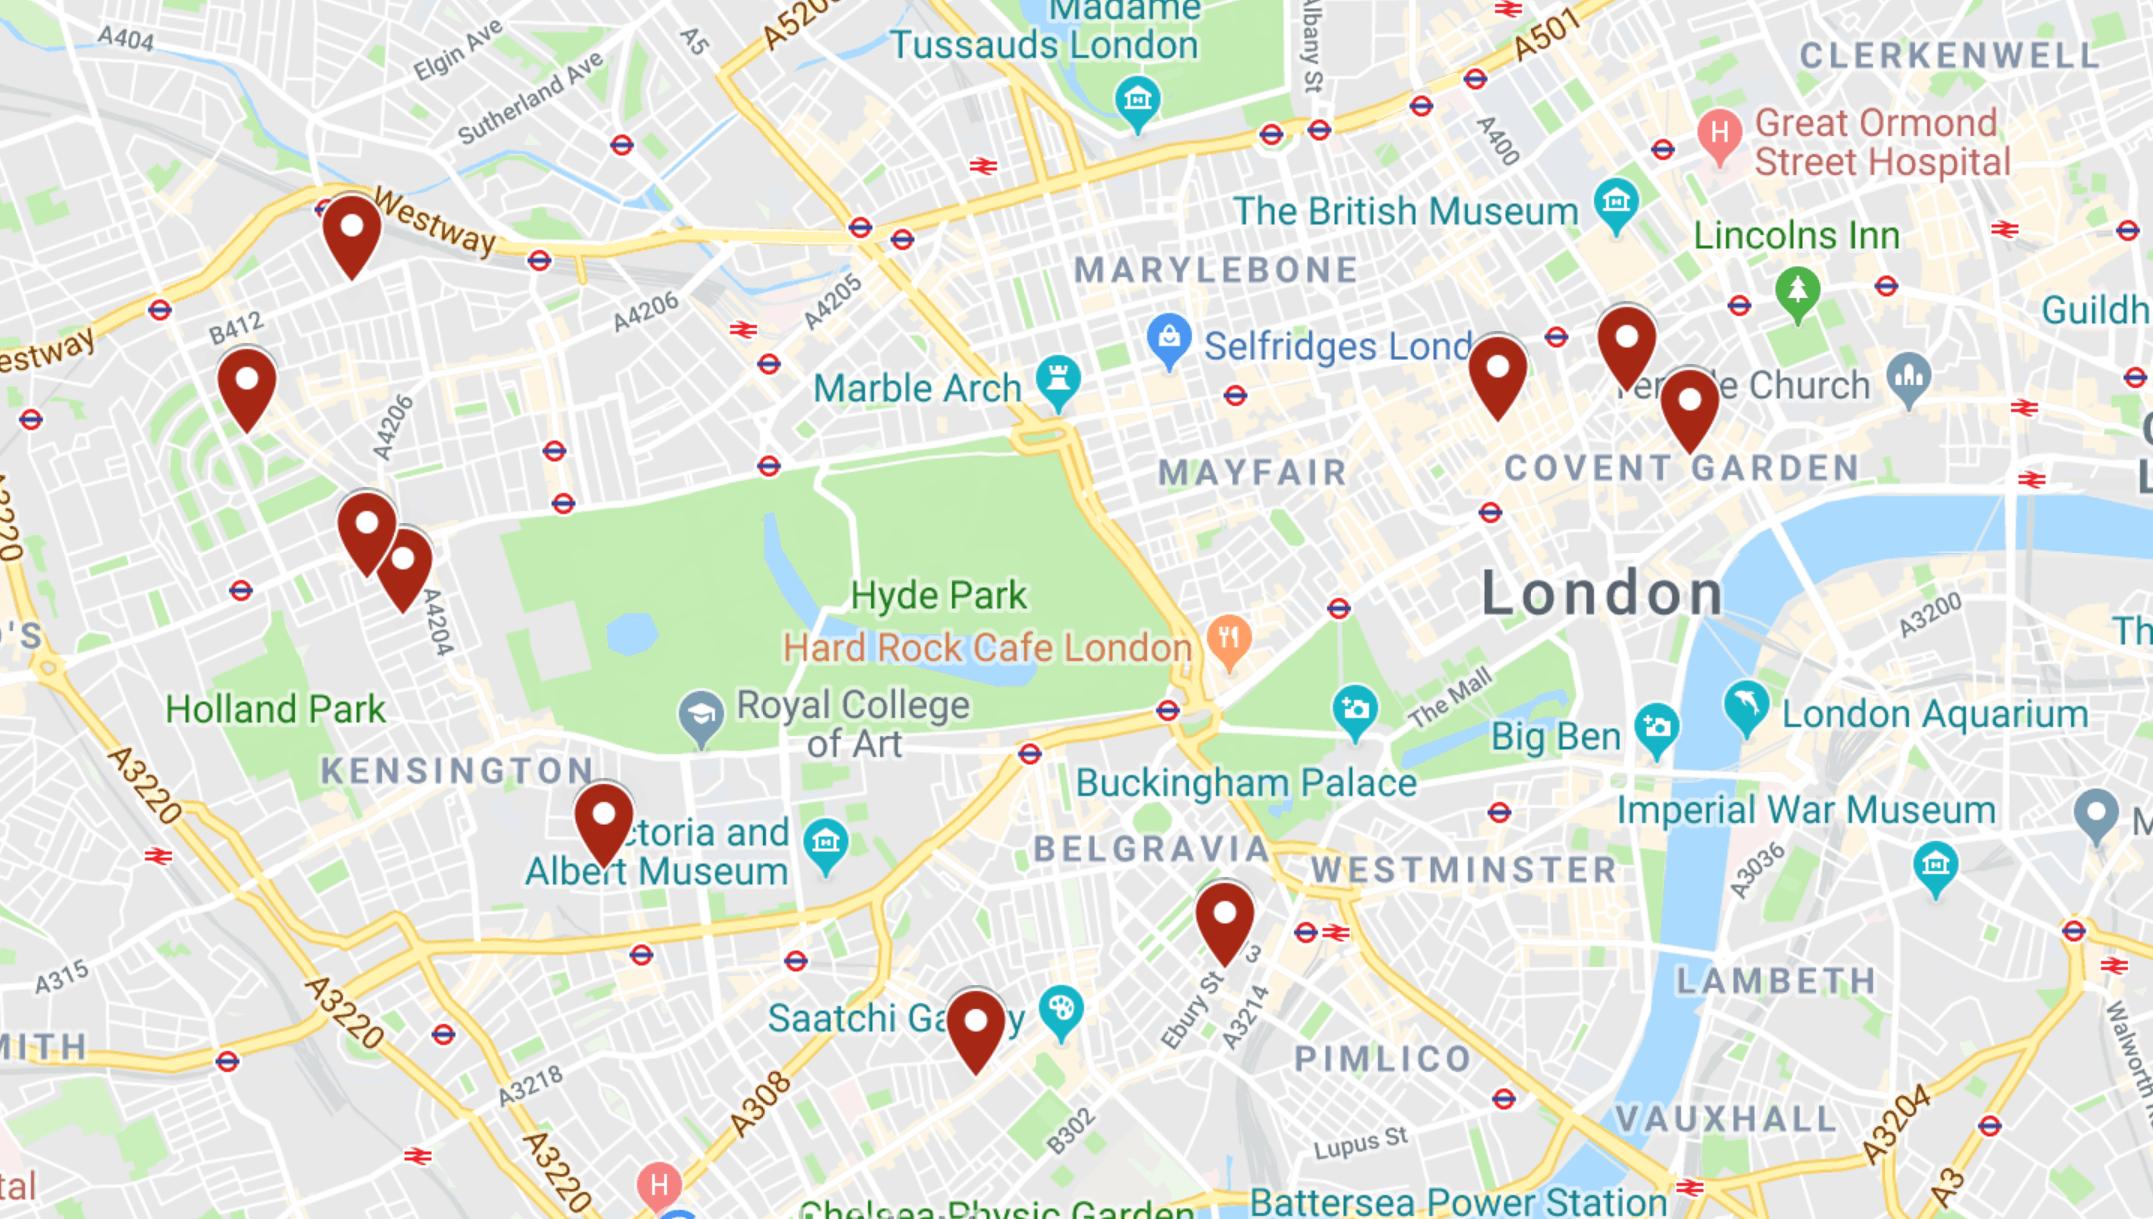 Map Of The Prettiest Streets In London | London Street Map